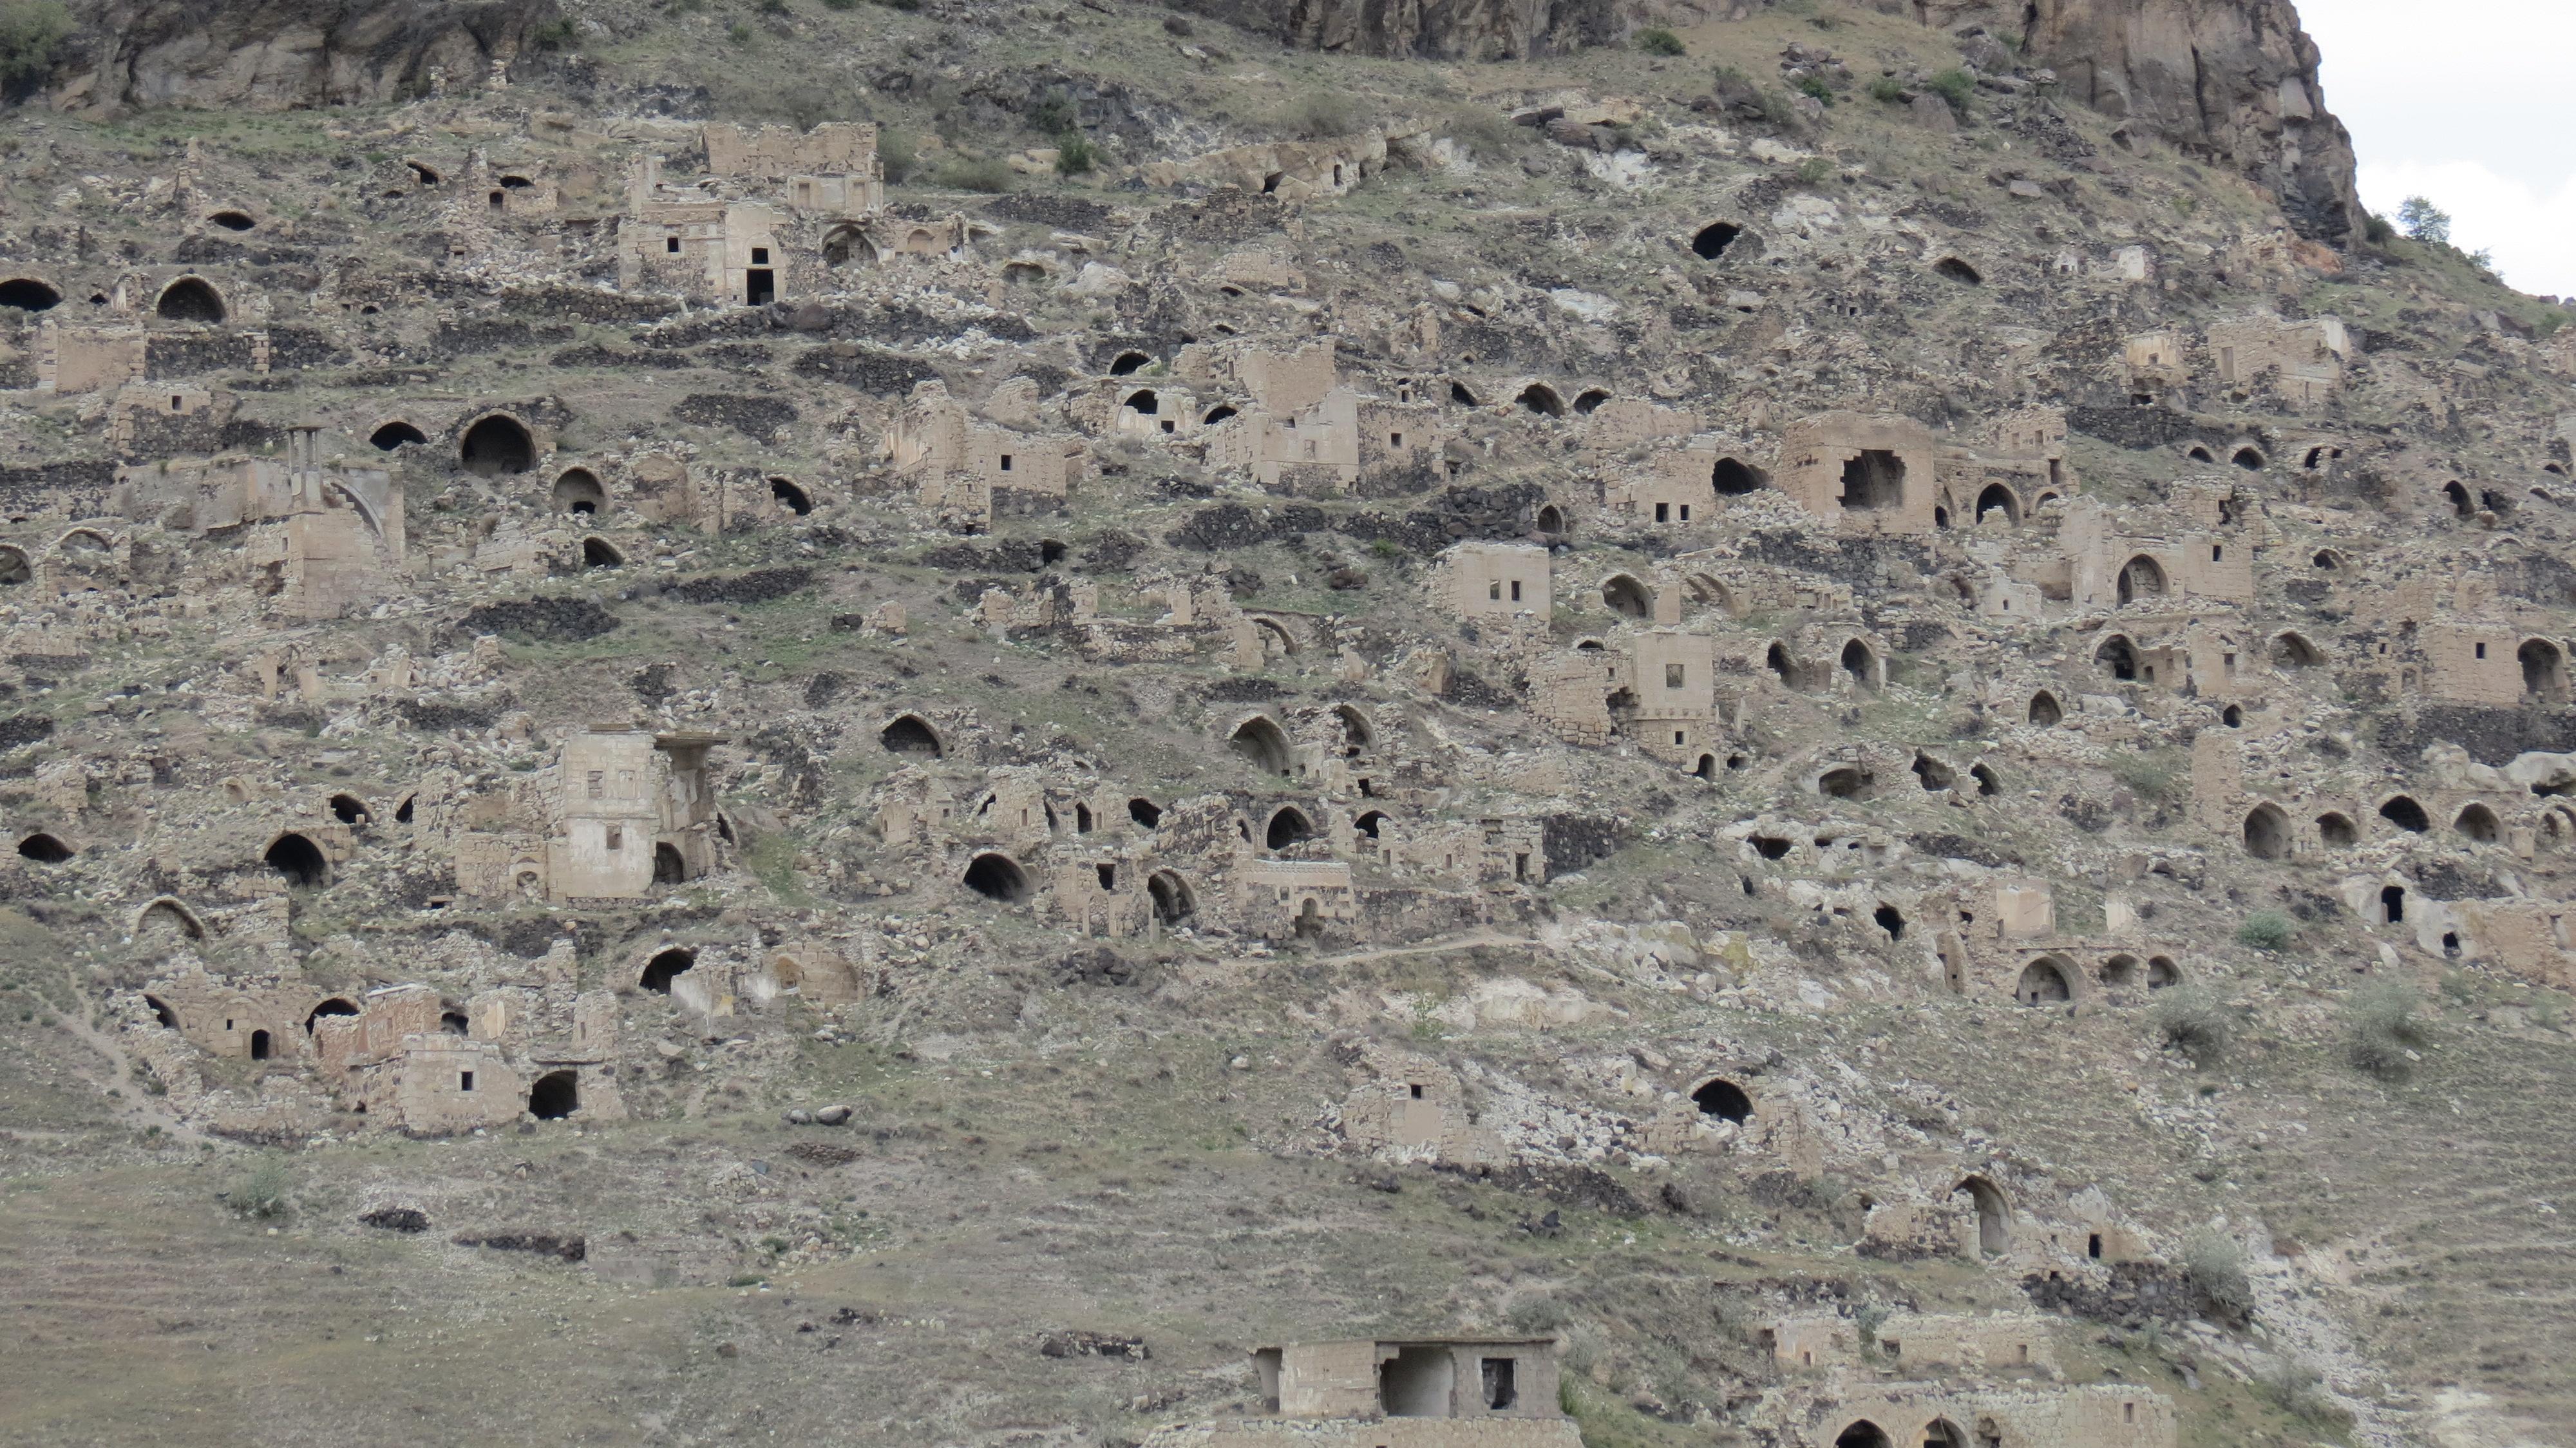 Luca Errera, Daniela Trastulli, Turchia, Cappadocia, villaggi abbandonati